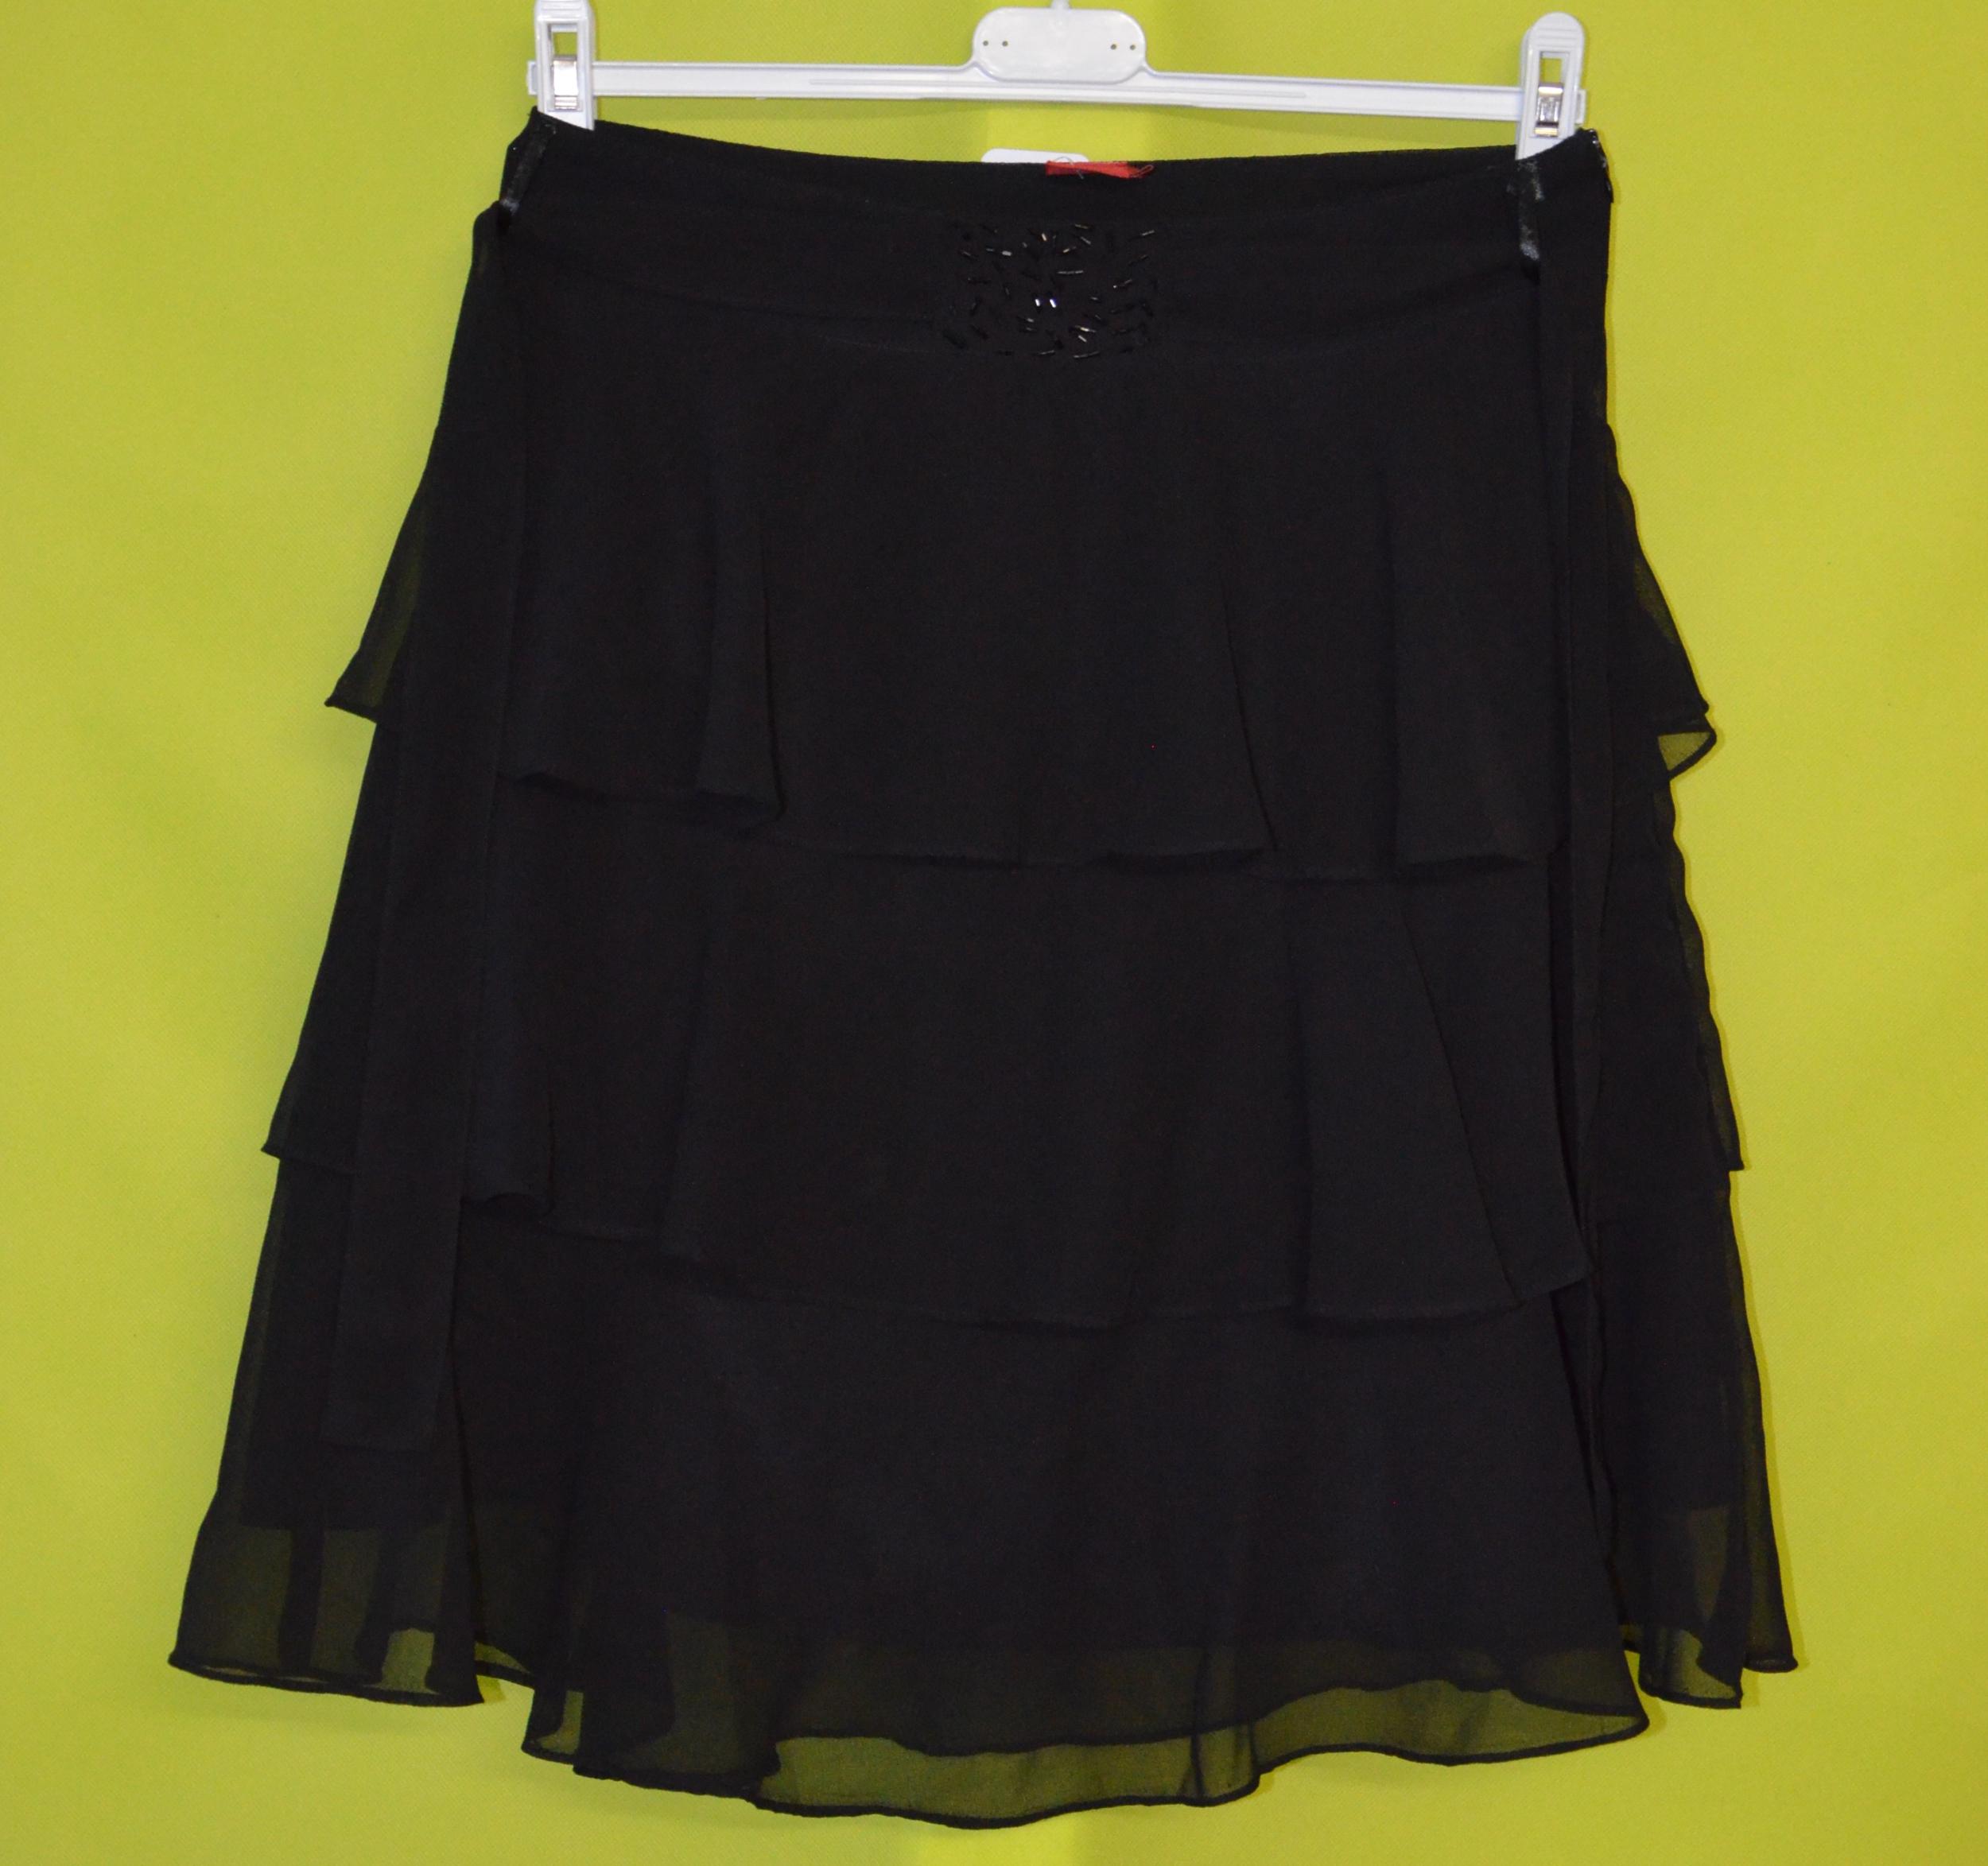 jupe noir femme taille 38 tissaia